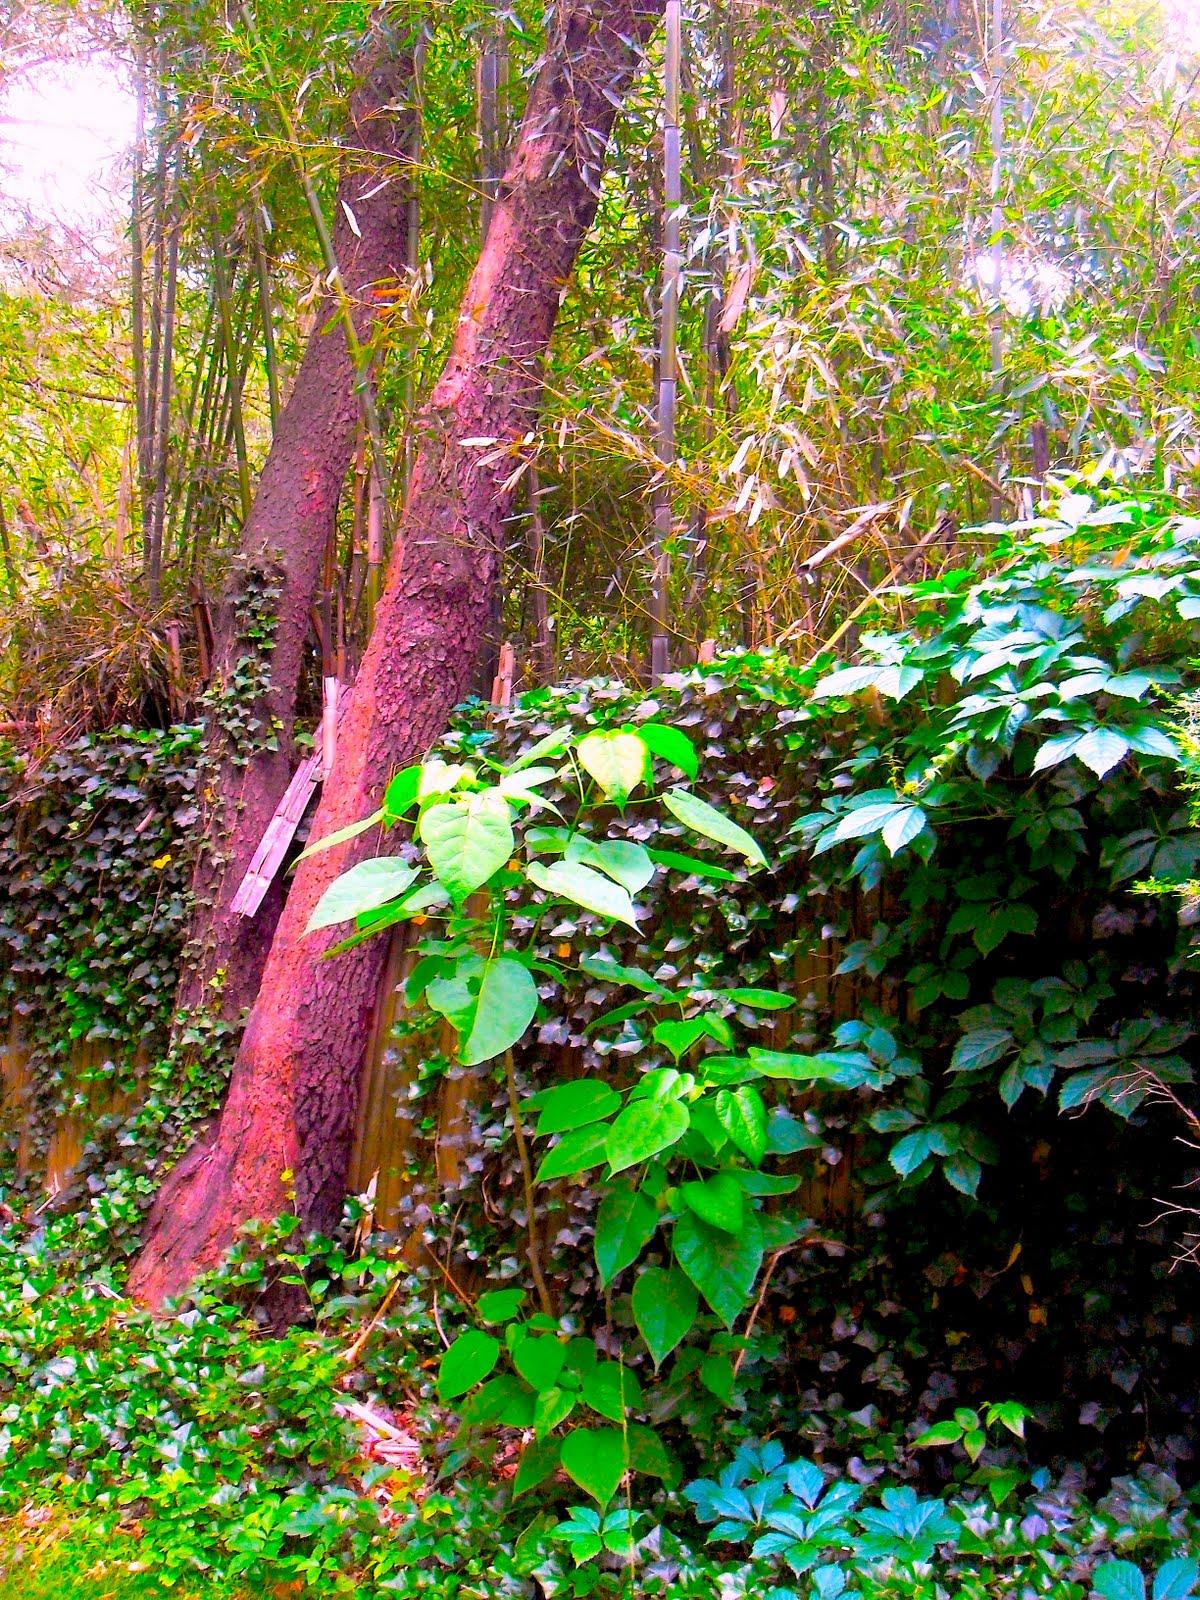 Nj Bamboo Landscaping: ART SKOOL DAMAGE : Christian Montone: Jodie's Equine